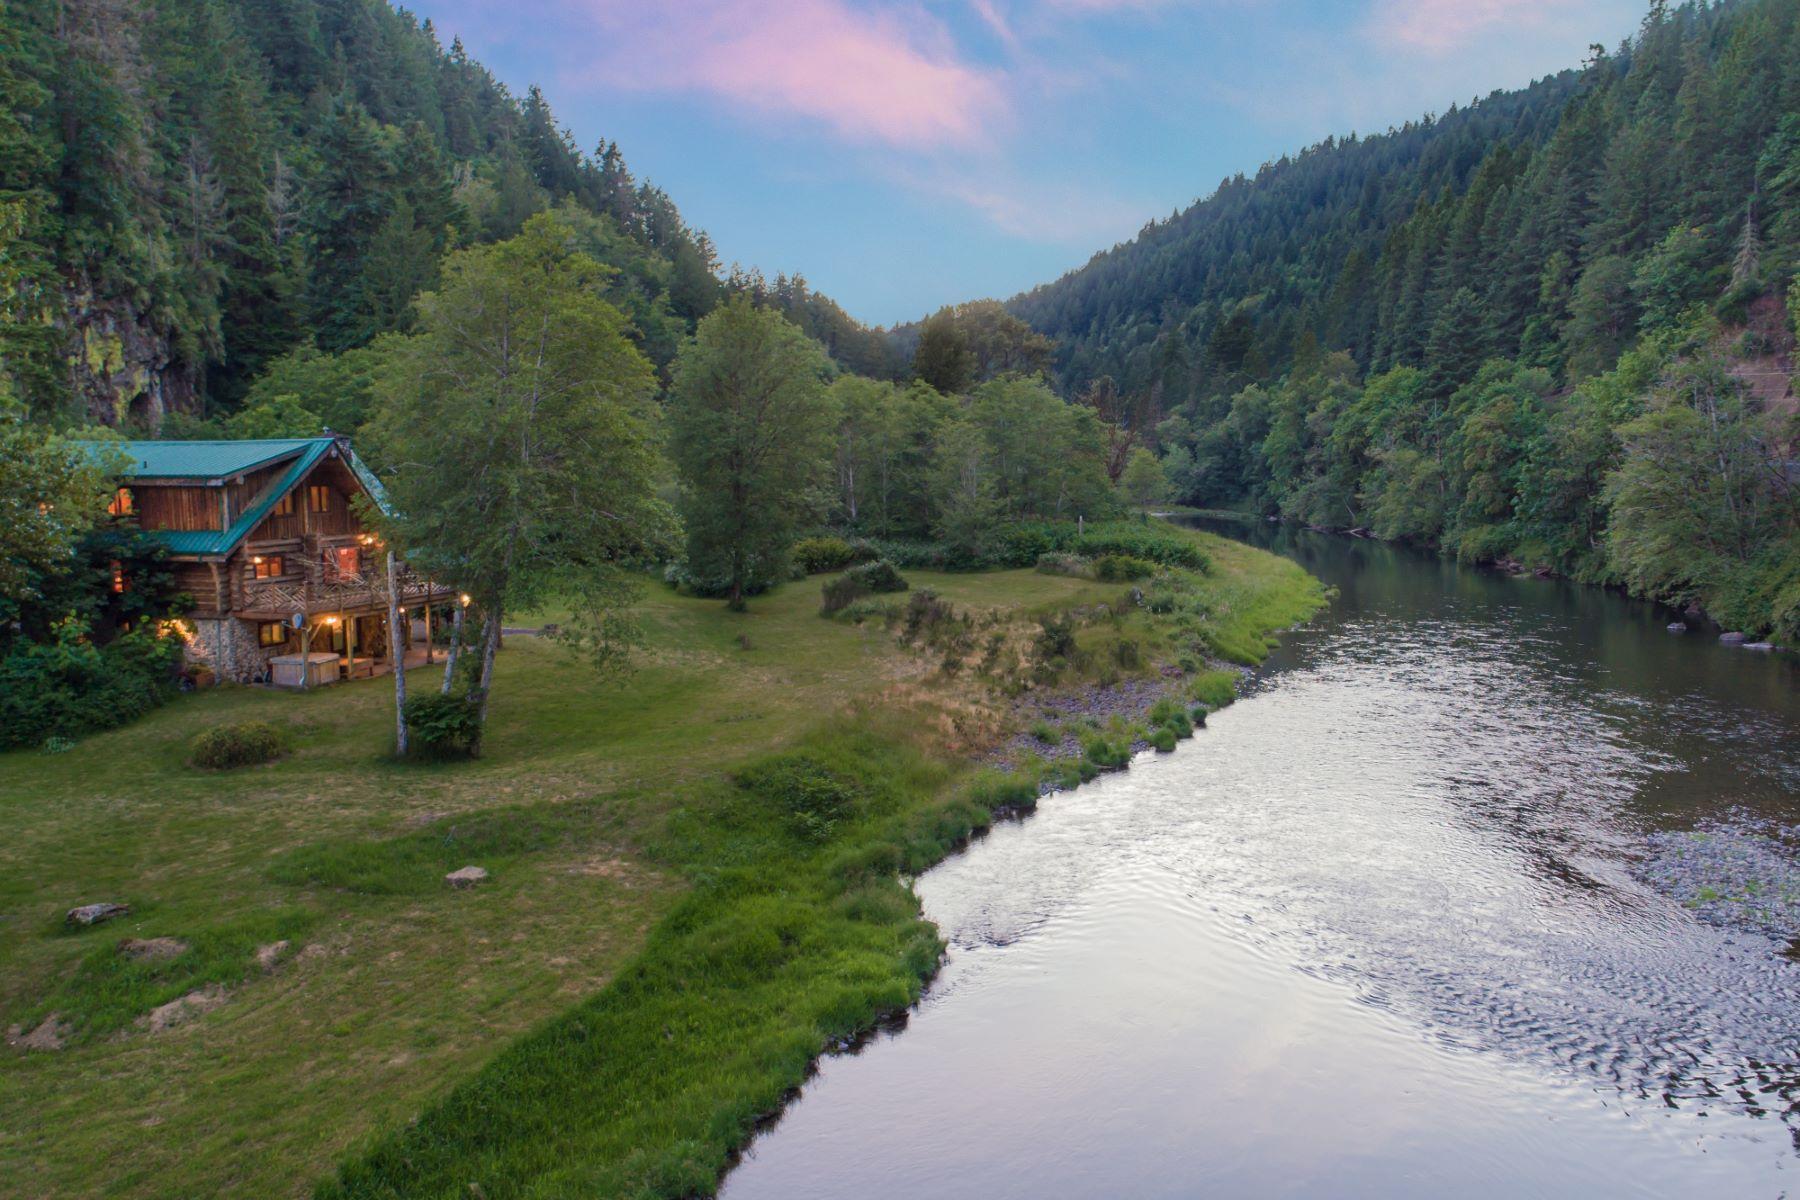 Single Family Homes for Sale at Idyllic Cabin on Kalama River 616 Modrow Road Kalama, Washington 98625 United States